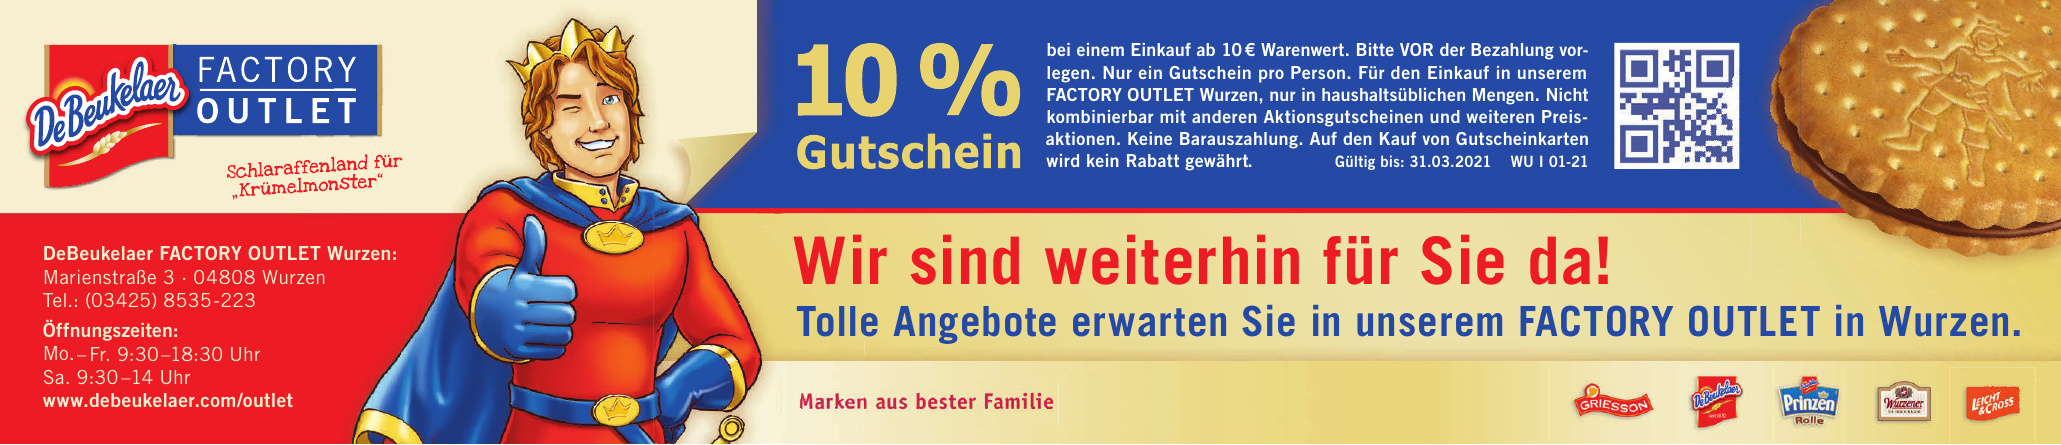 DeBeukelaer Factory Outlet